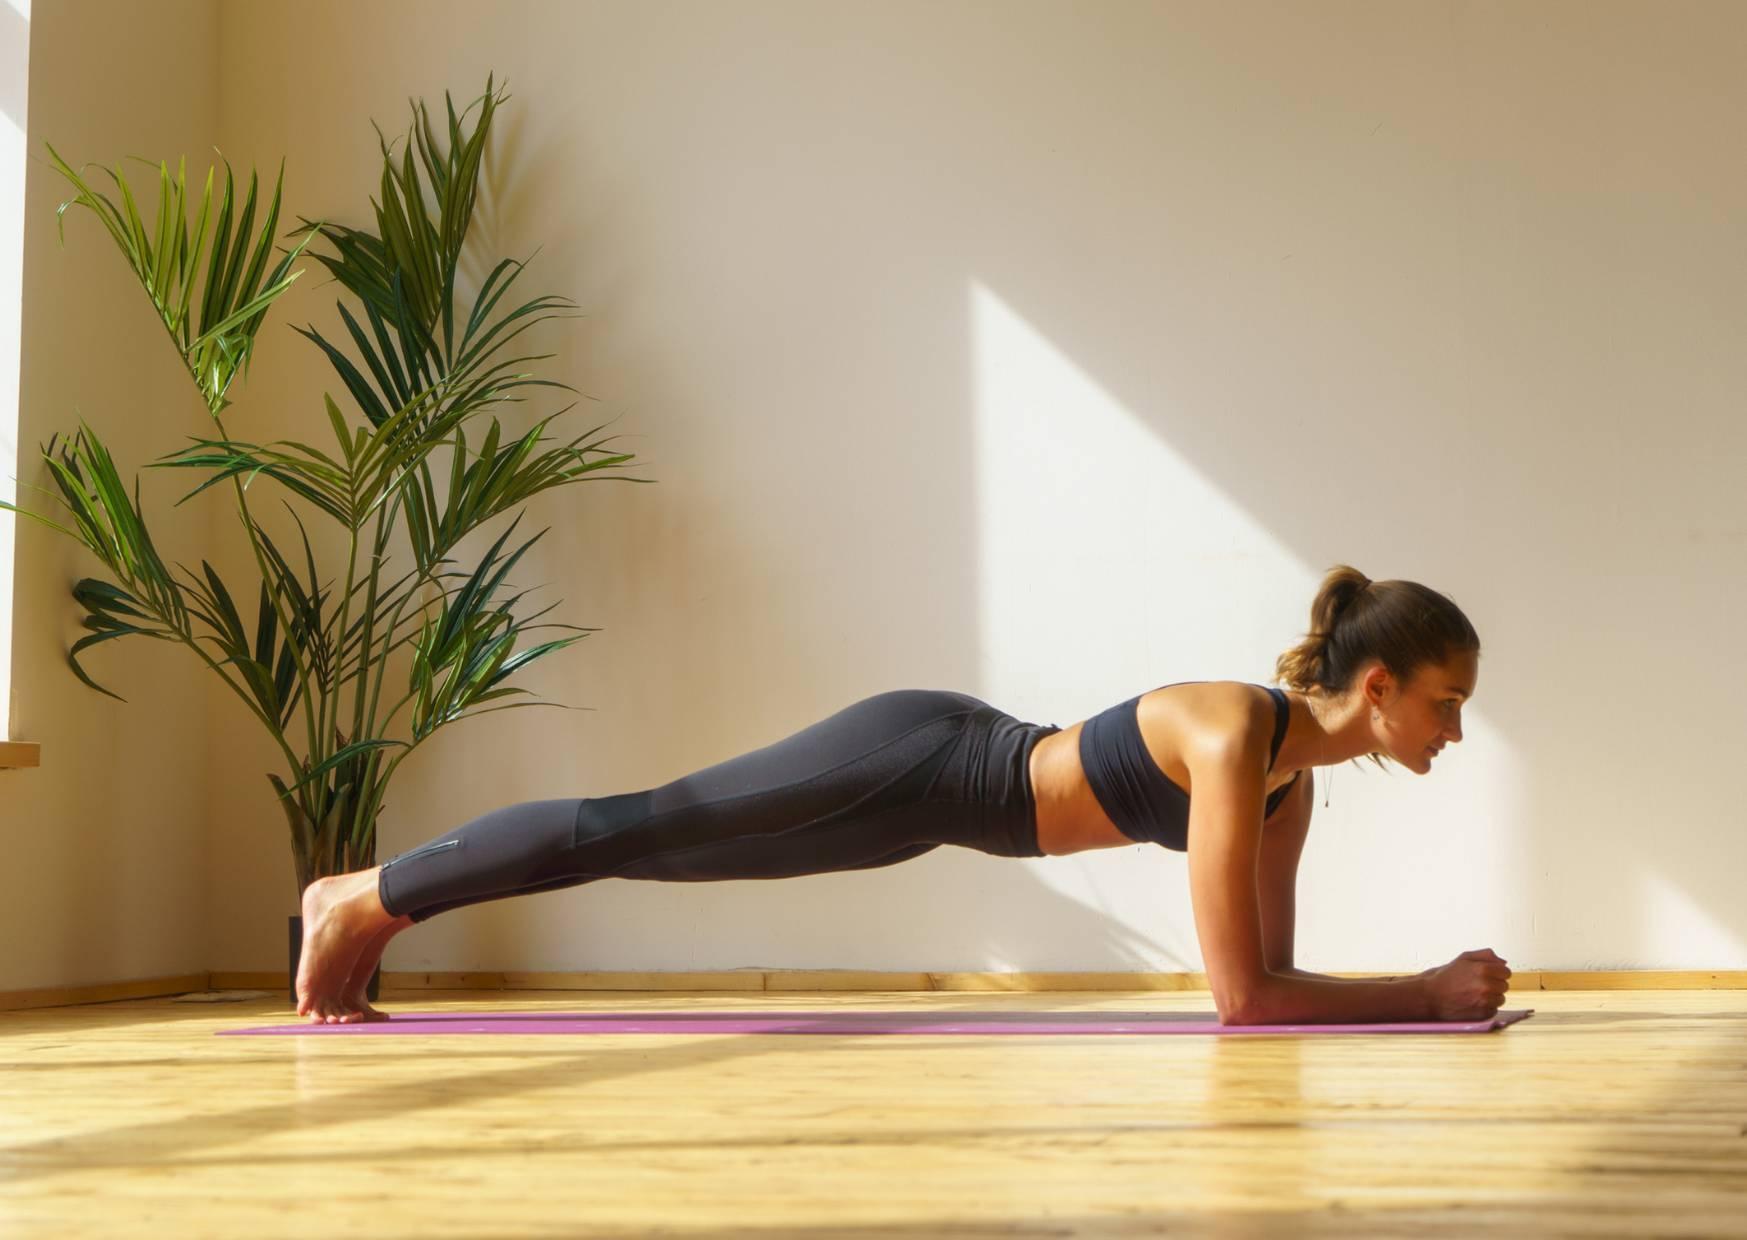 exercising when pregnant